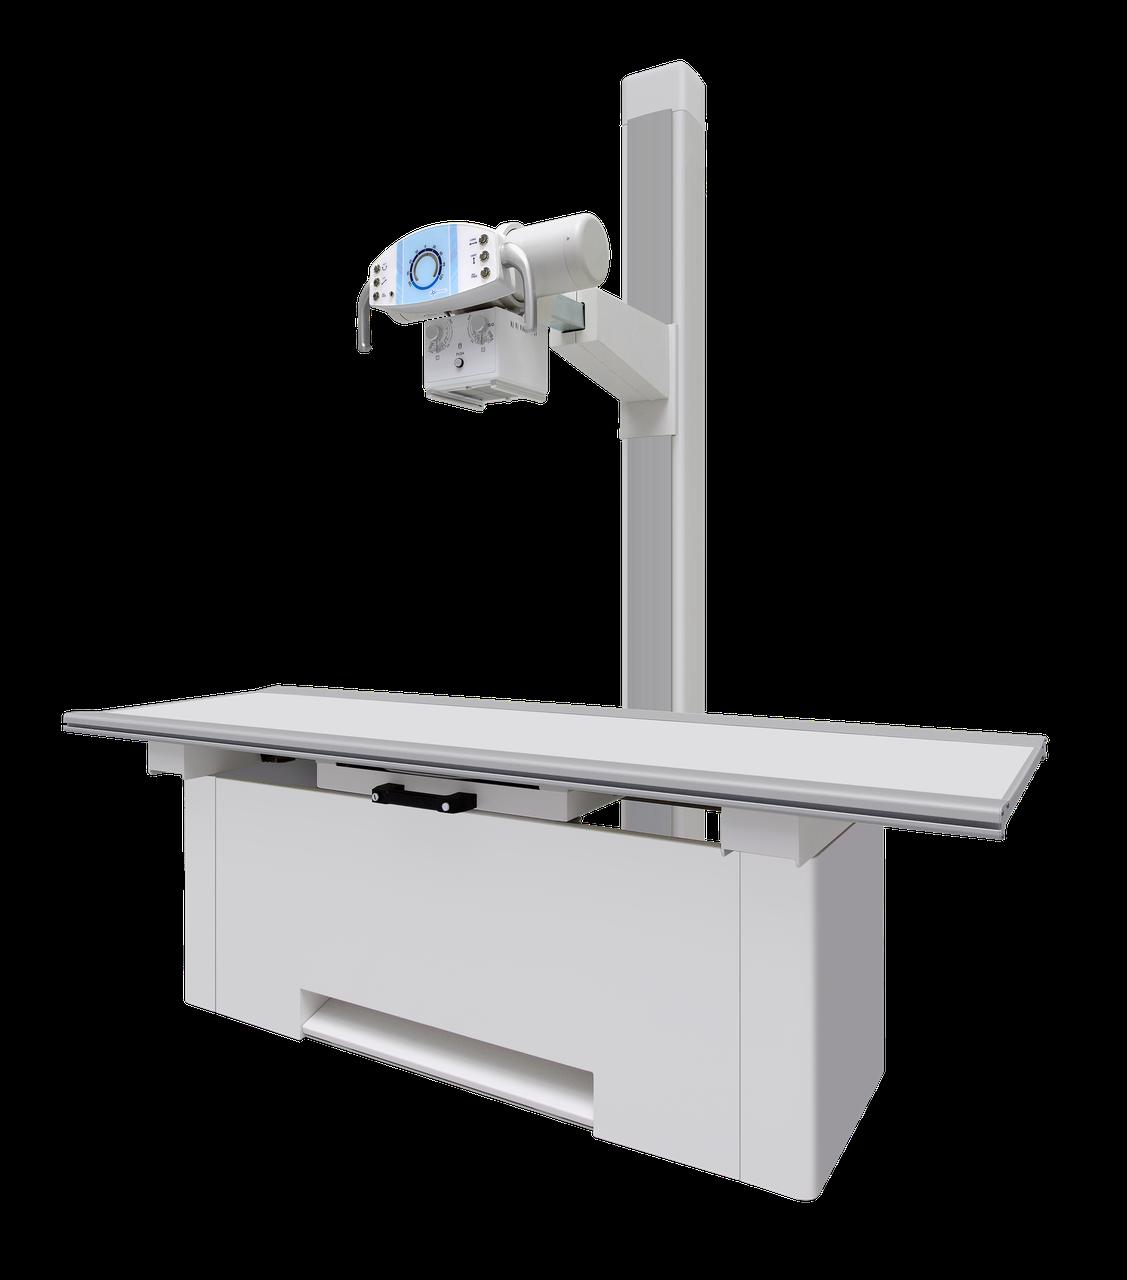 Стационарная цифровая рентгеновская система DRE 150